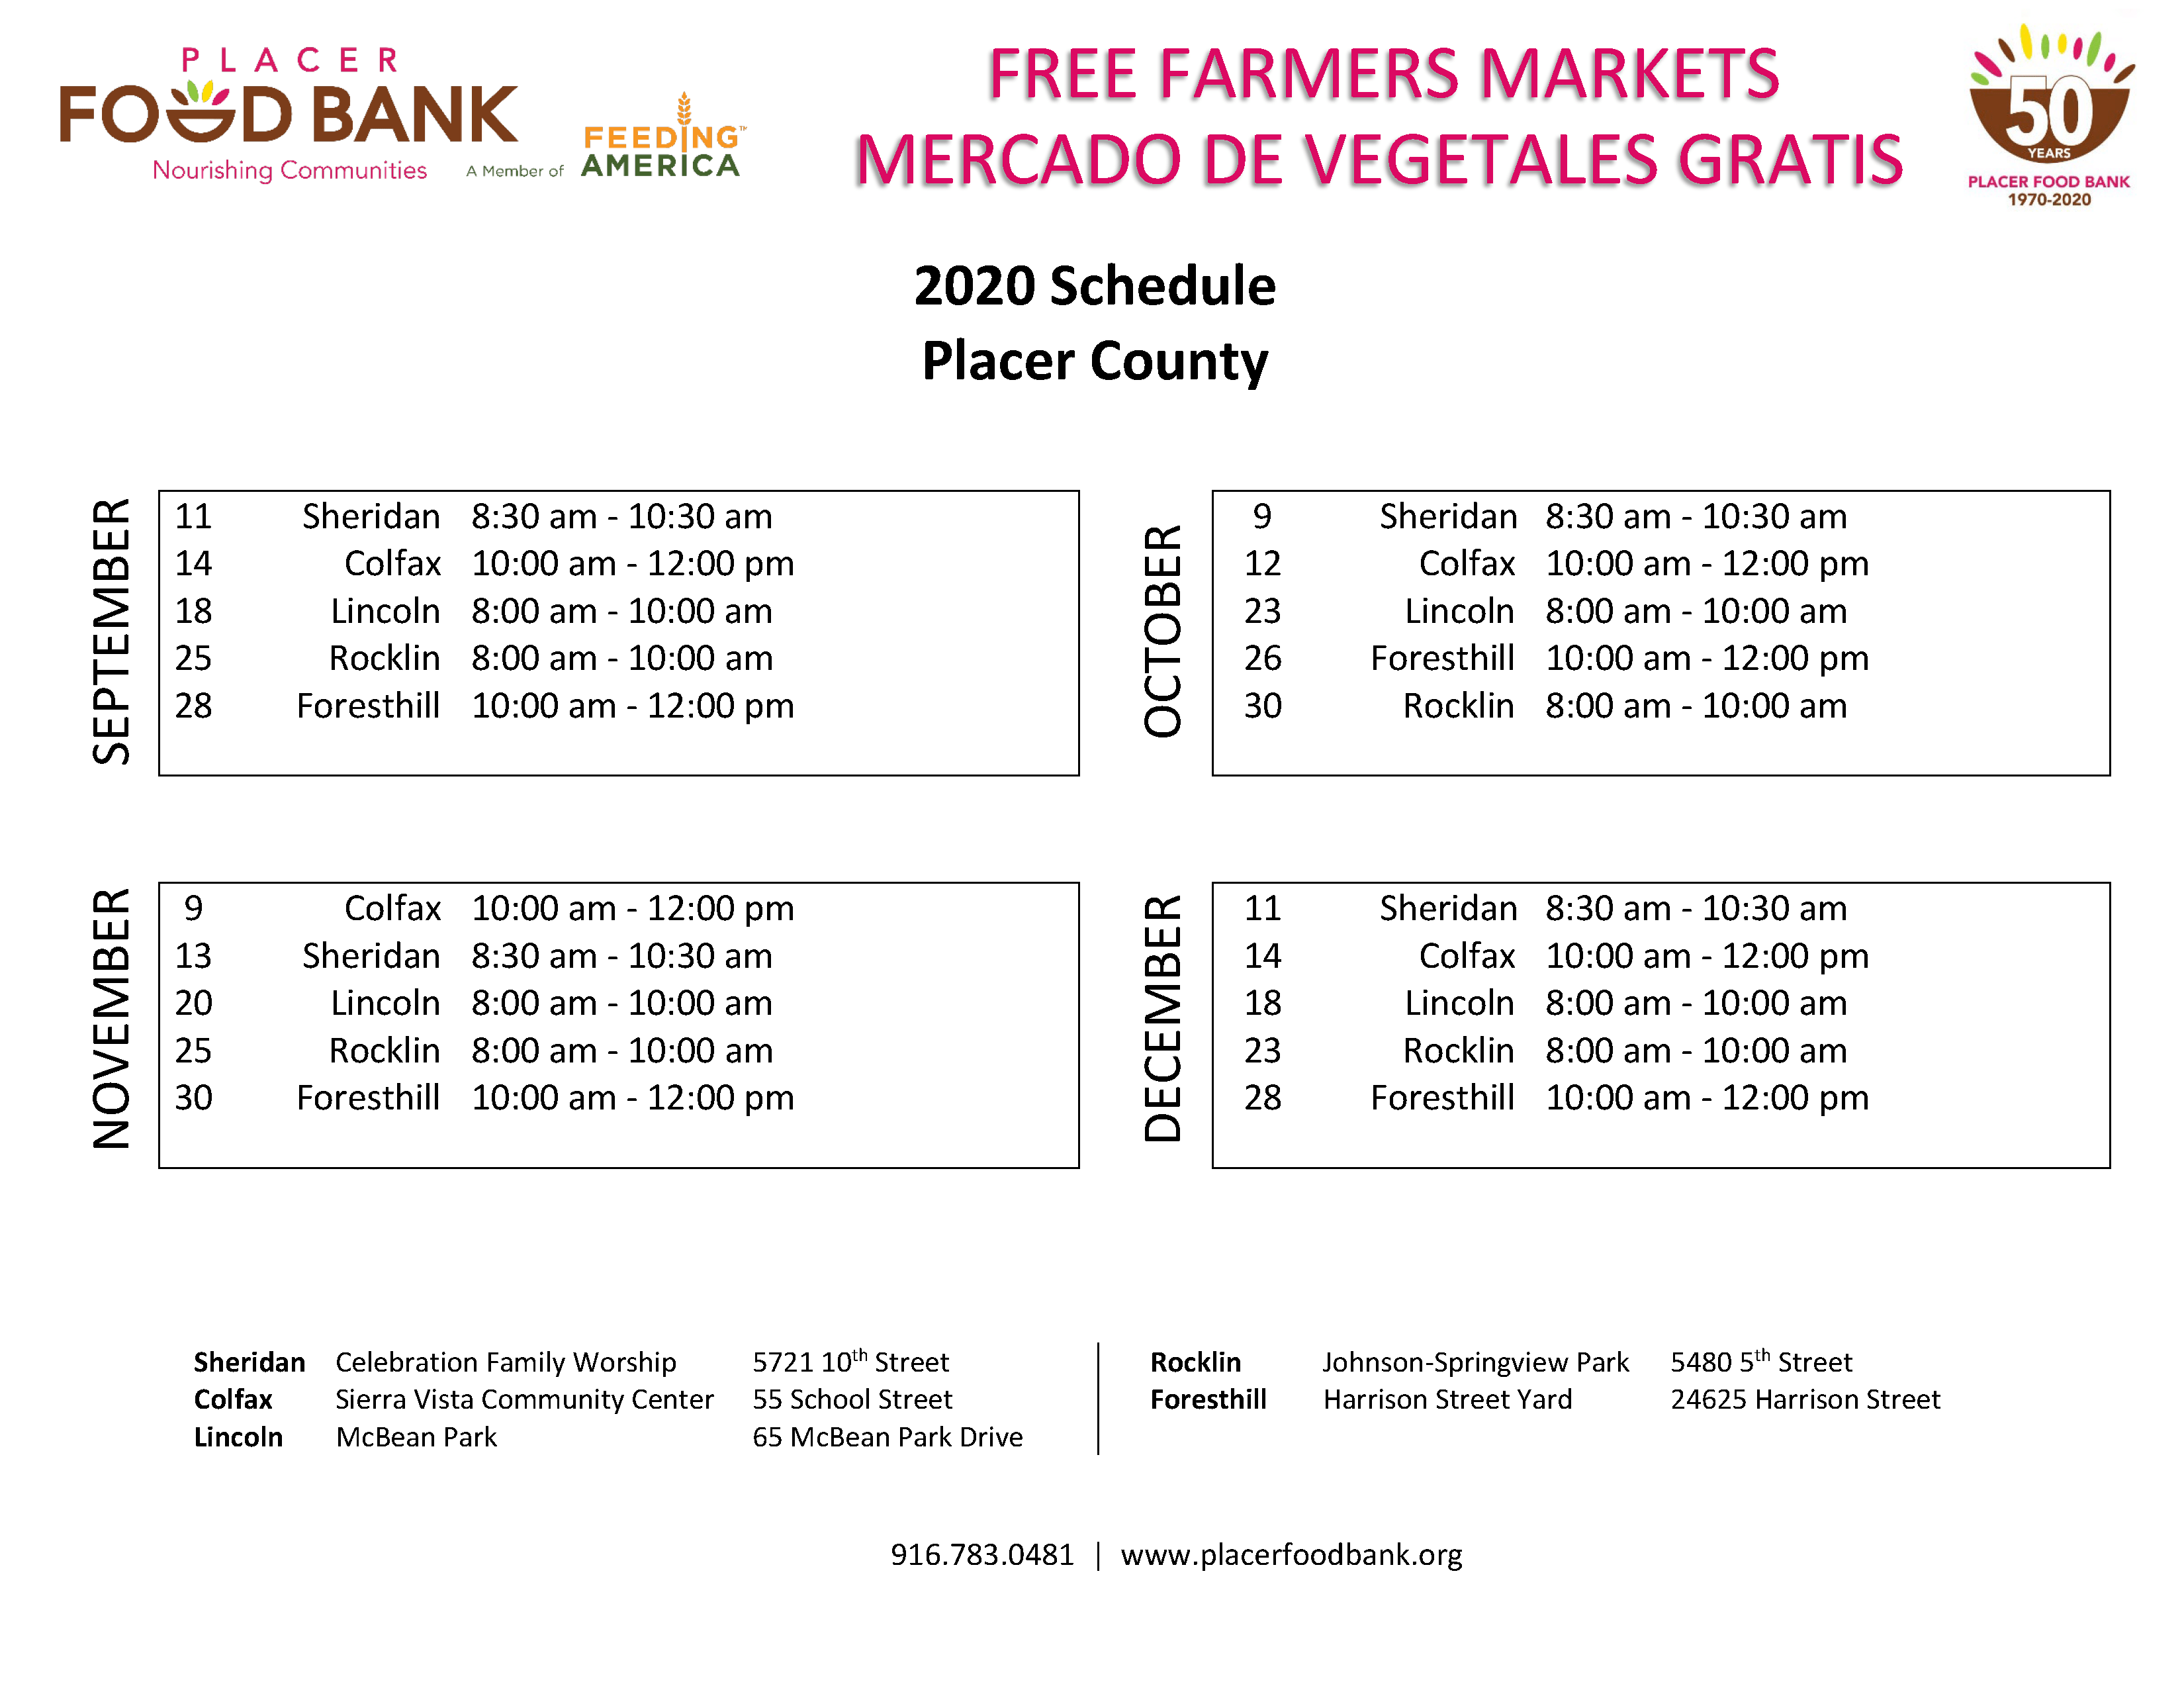 FFM Schedule - Placer County 2020